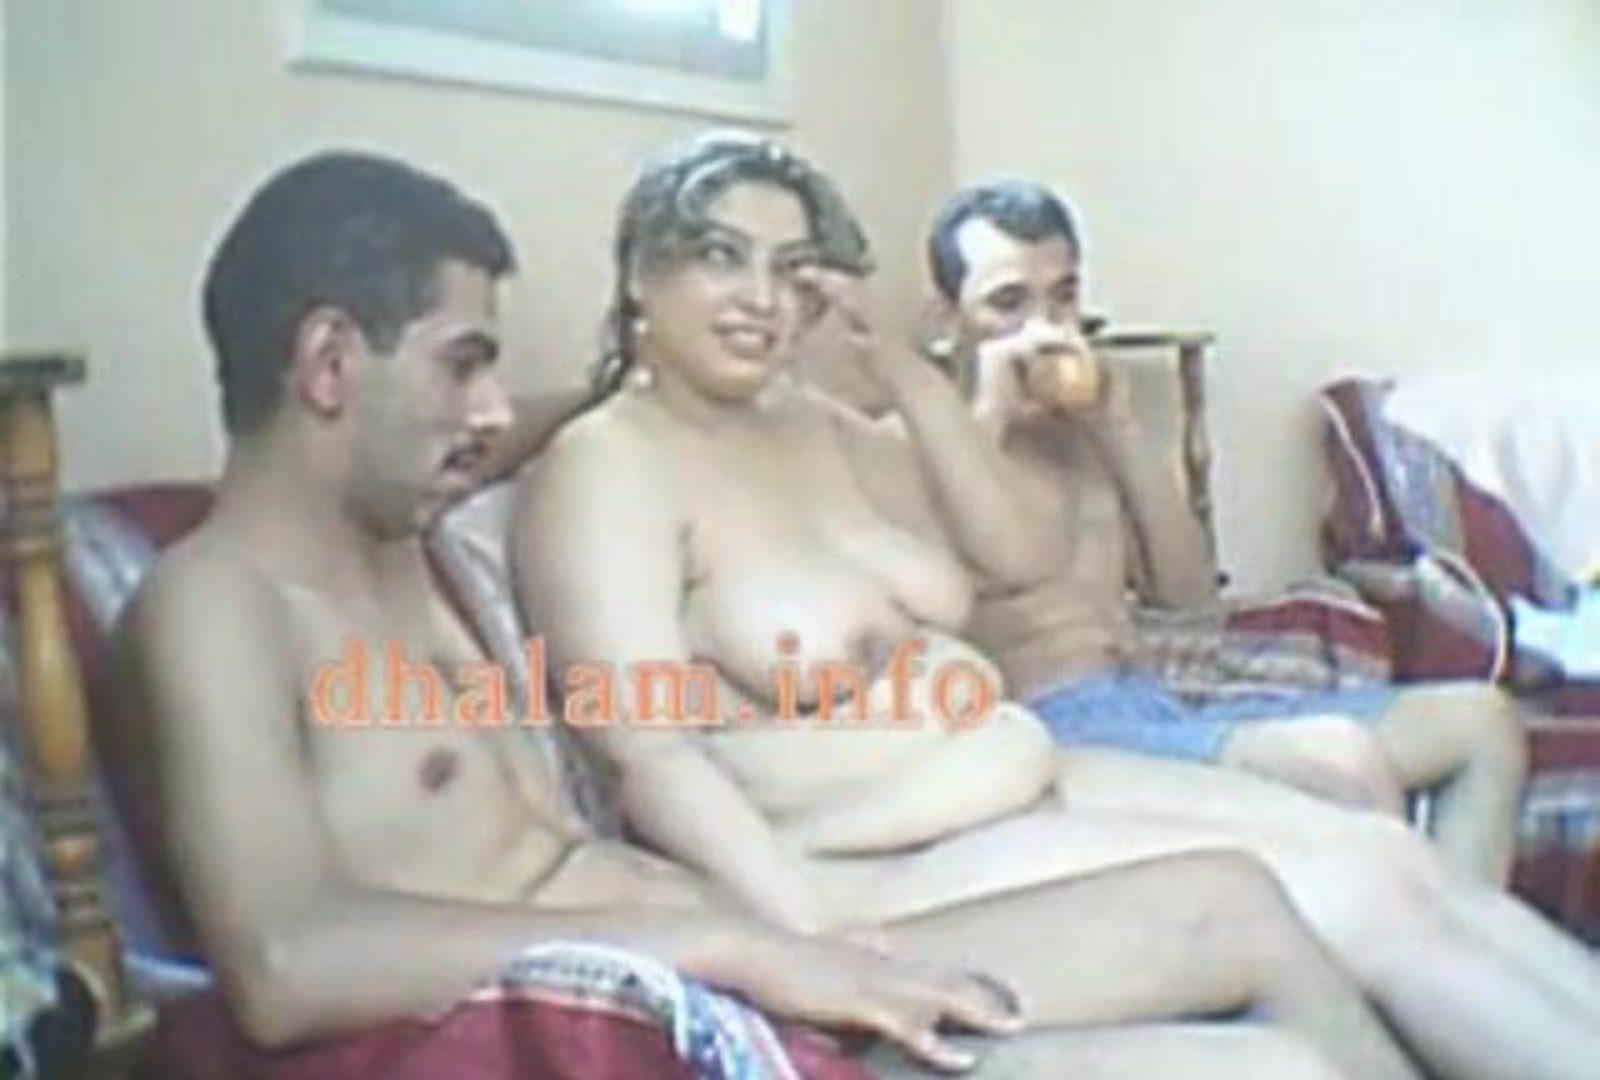 Porn Sex Wife Horny Arabic Ex Egyptian Xvideos Kos Araby Arby